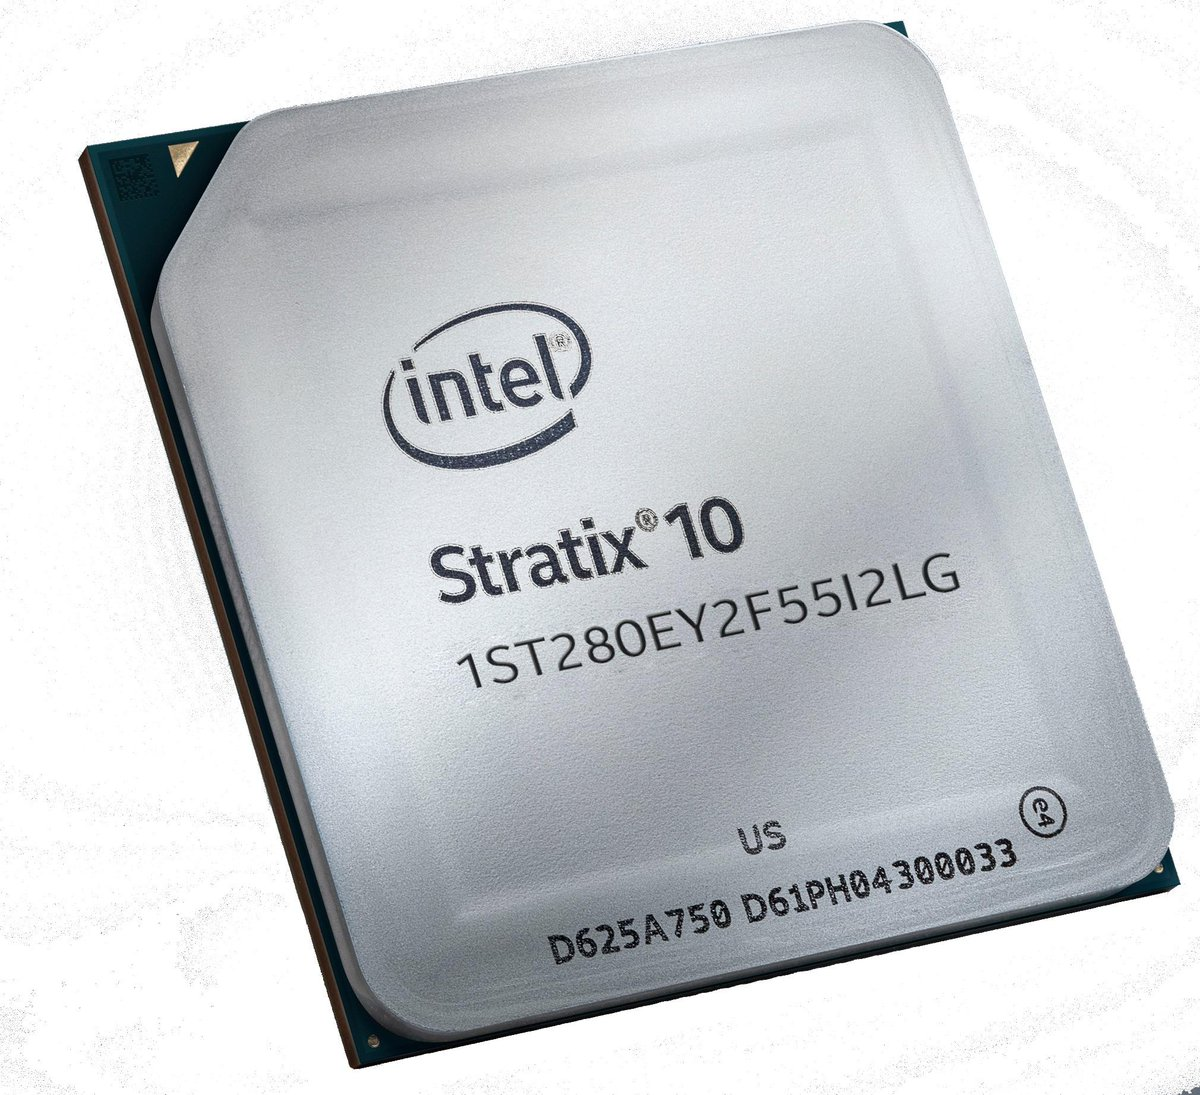 Intel FPGA on Twitter: